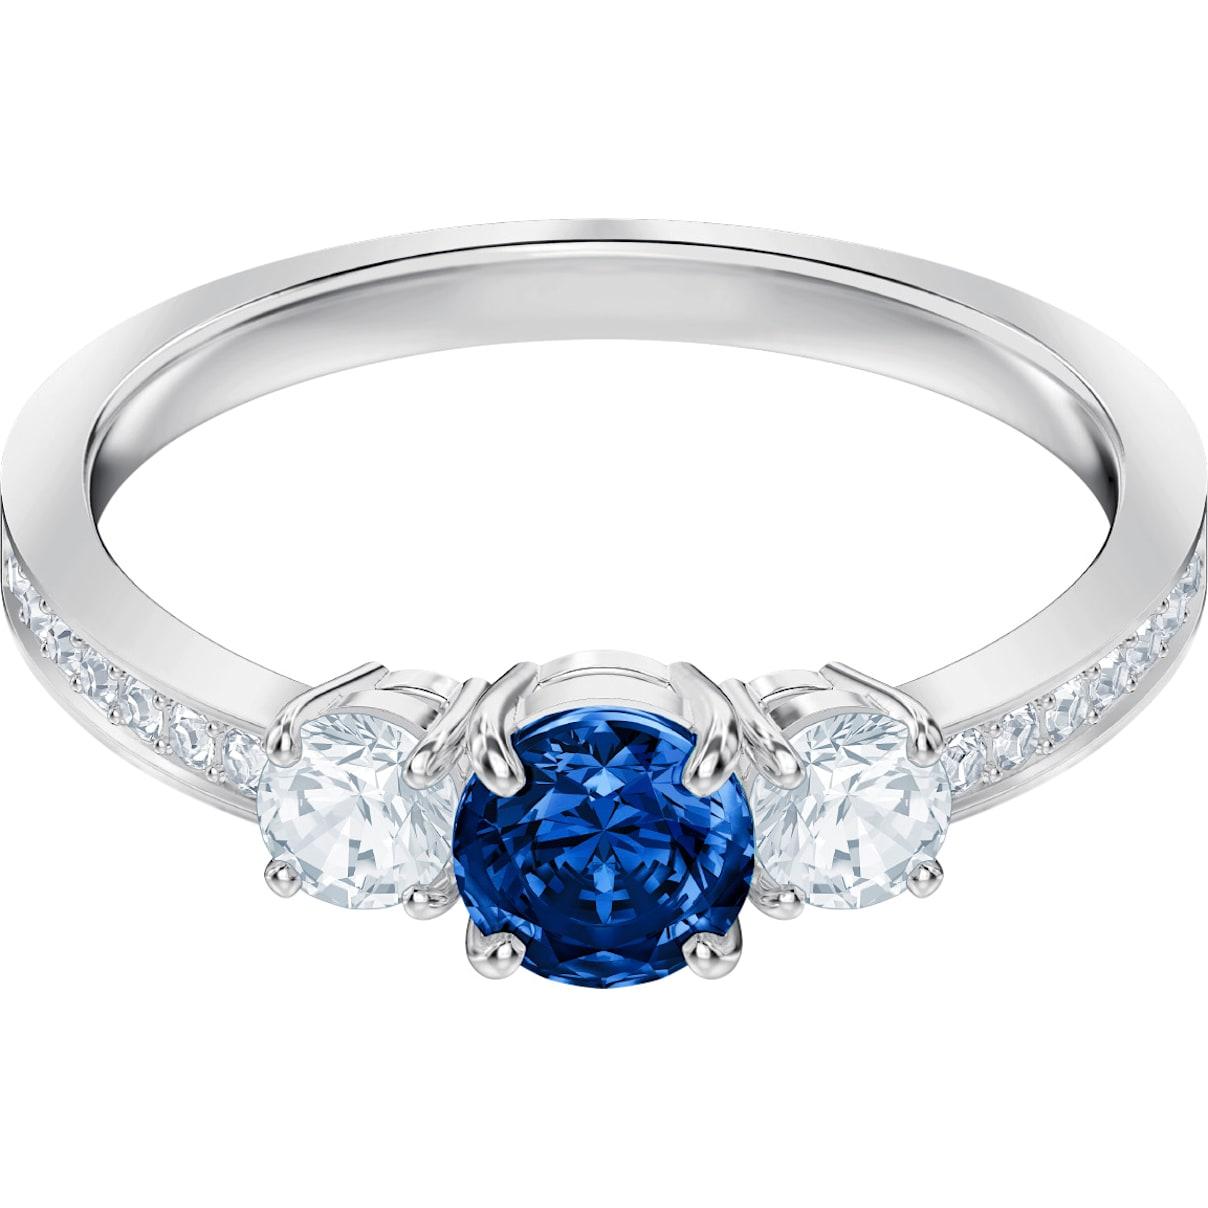 Swarovski Attract Trilogy Round Ring, Blue, Rhodium plated